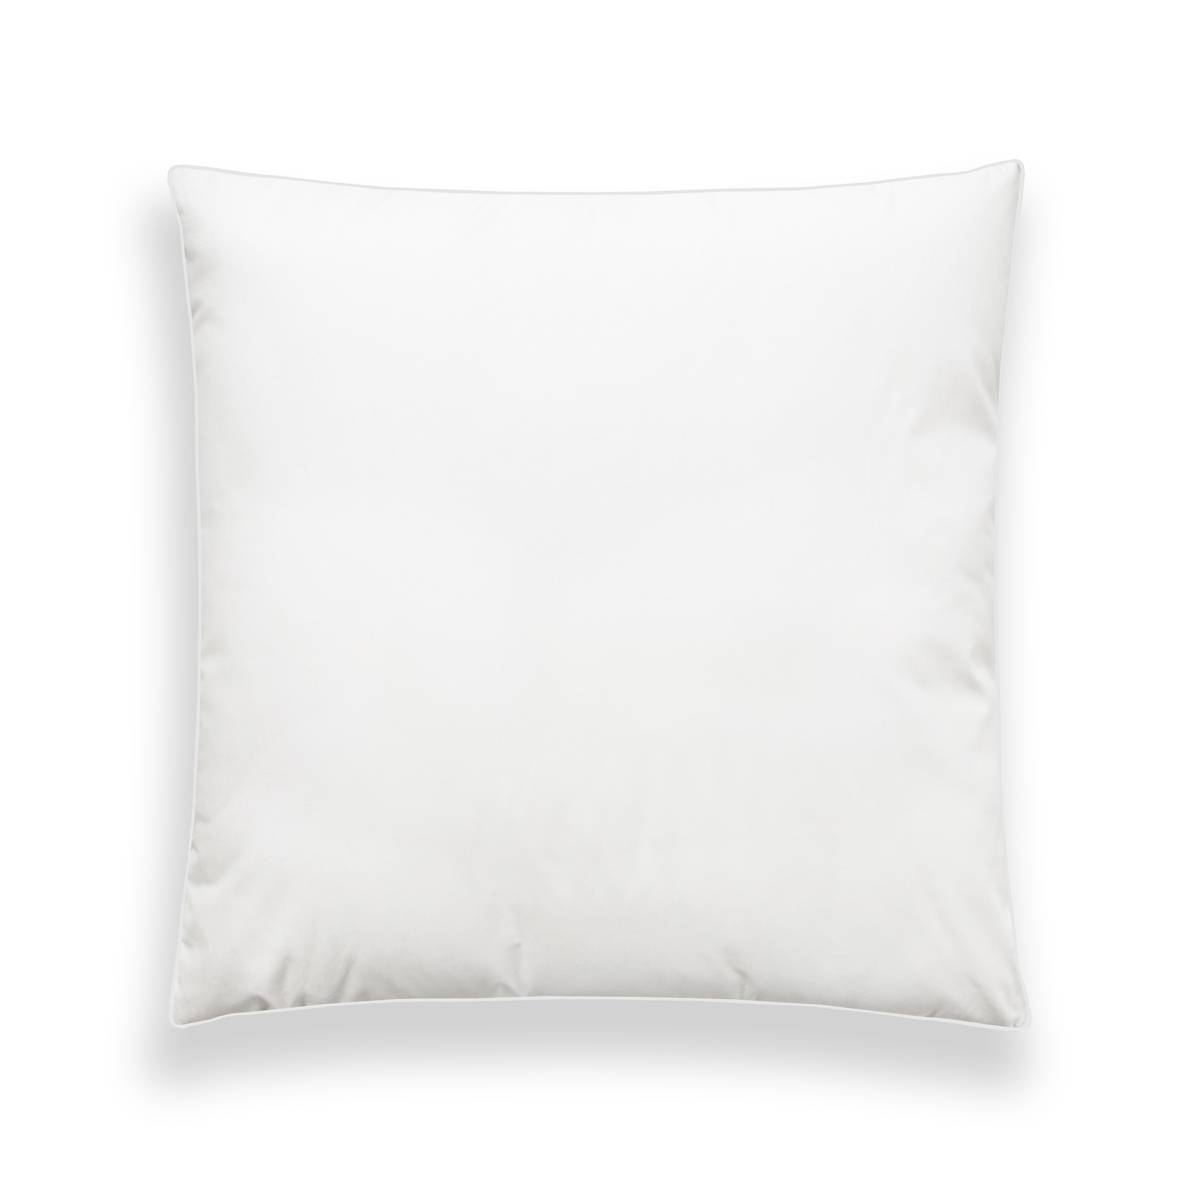 WAKE ME GREEN Oreiller FERME 10% Duvet - Coton Bio  50x75 cm